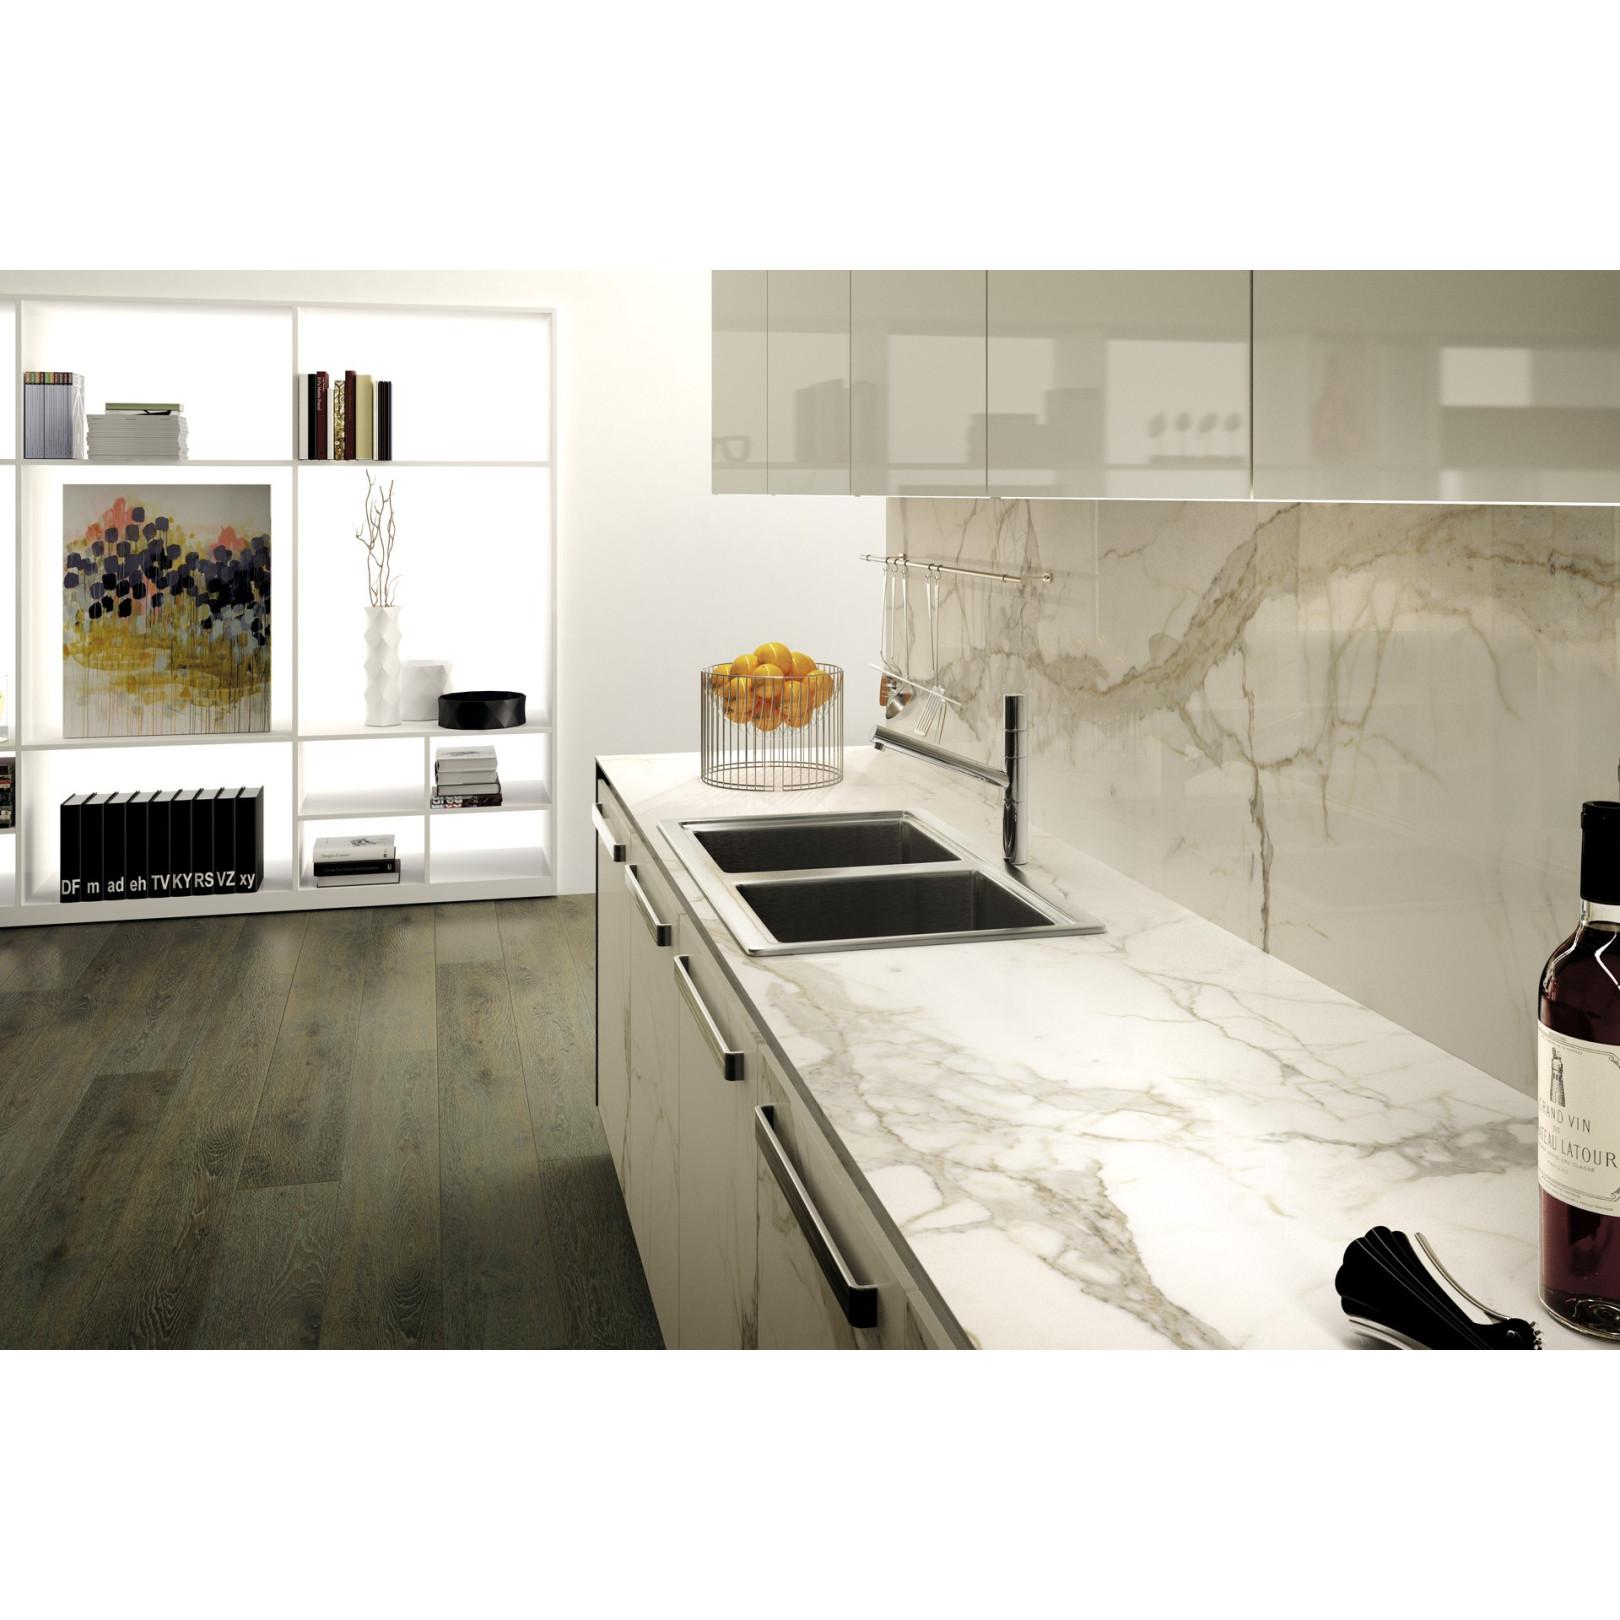 carrelage gr s c rame effet marbre mf calacatta rectifi. Black Bedroom Furniture Sets. Home Design Ideas